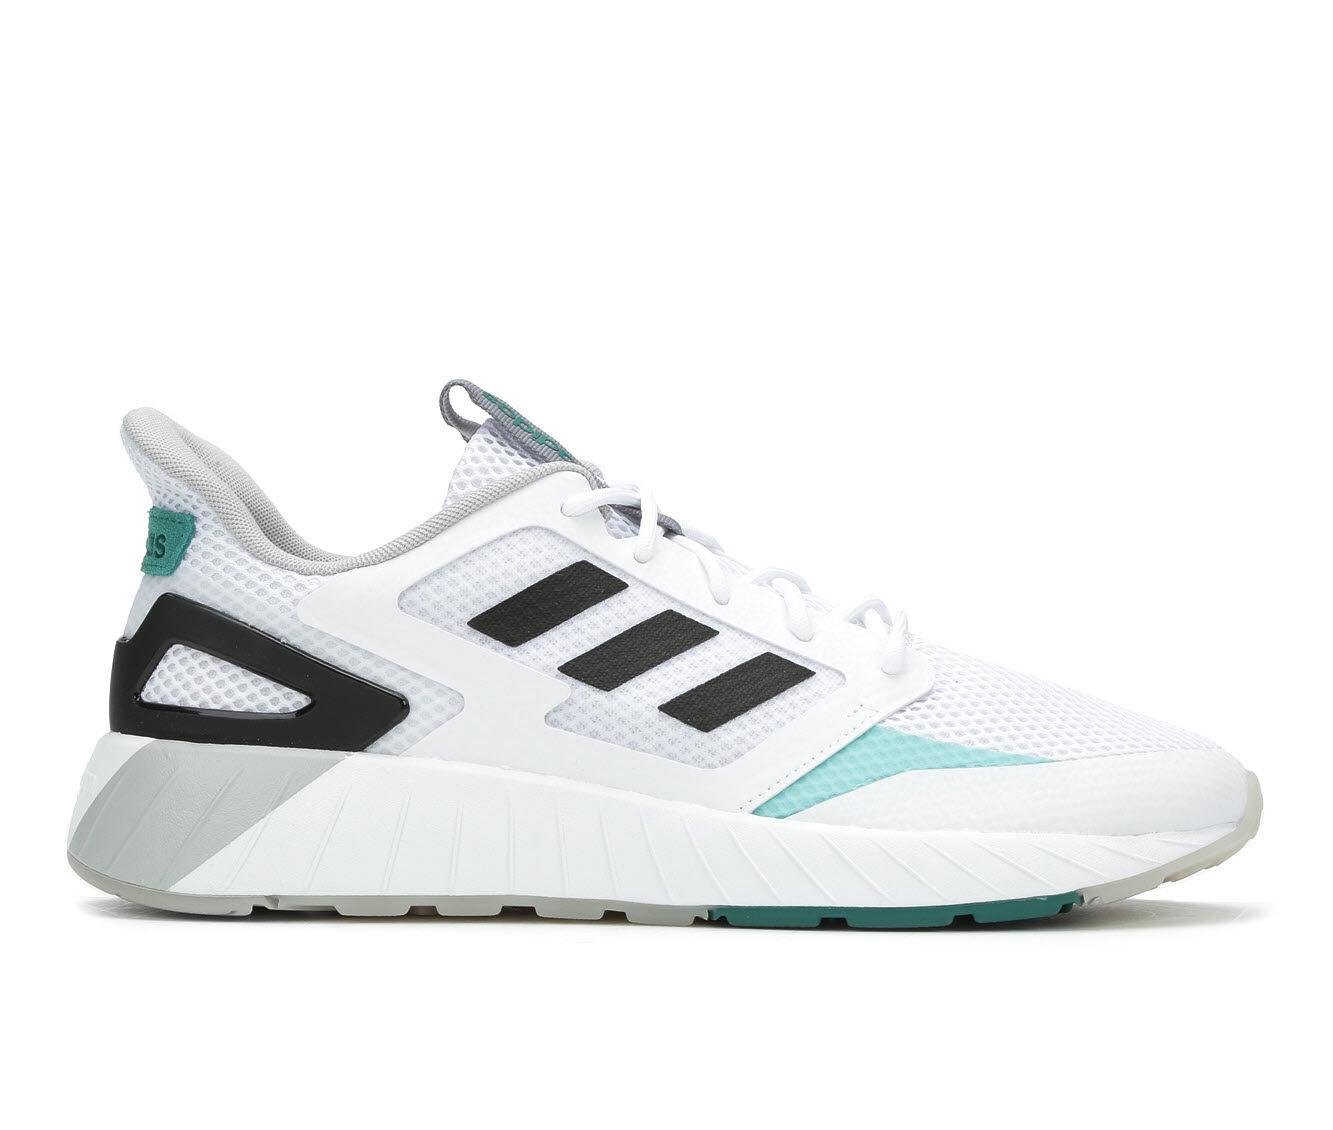 Men's Adidas Questar Strike Running Shoes Wht/Blk/Gry/Blu